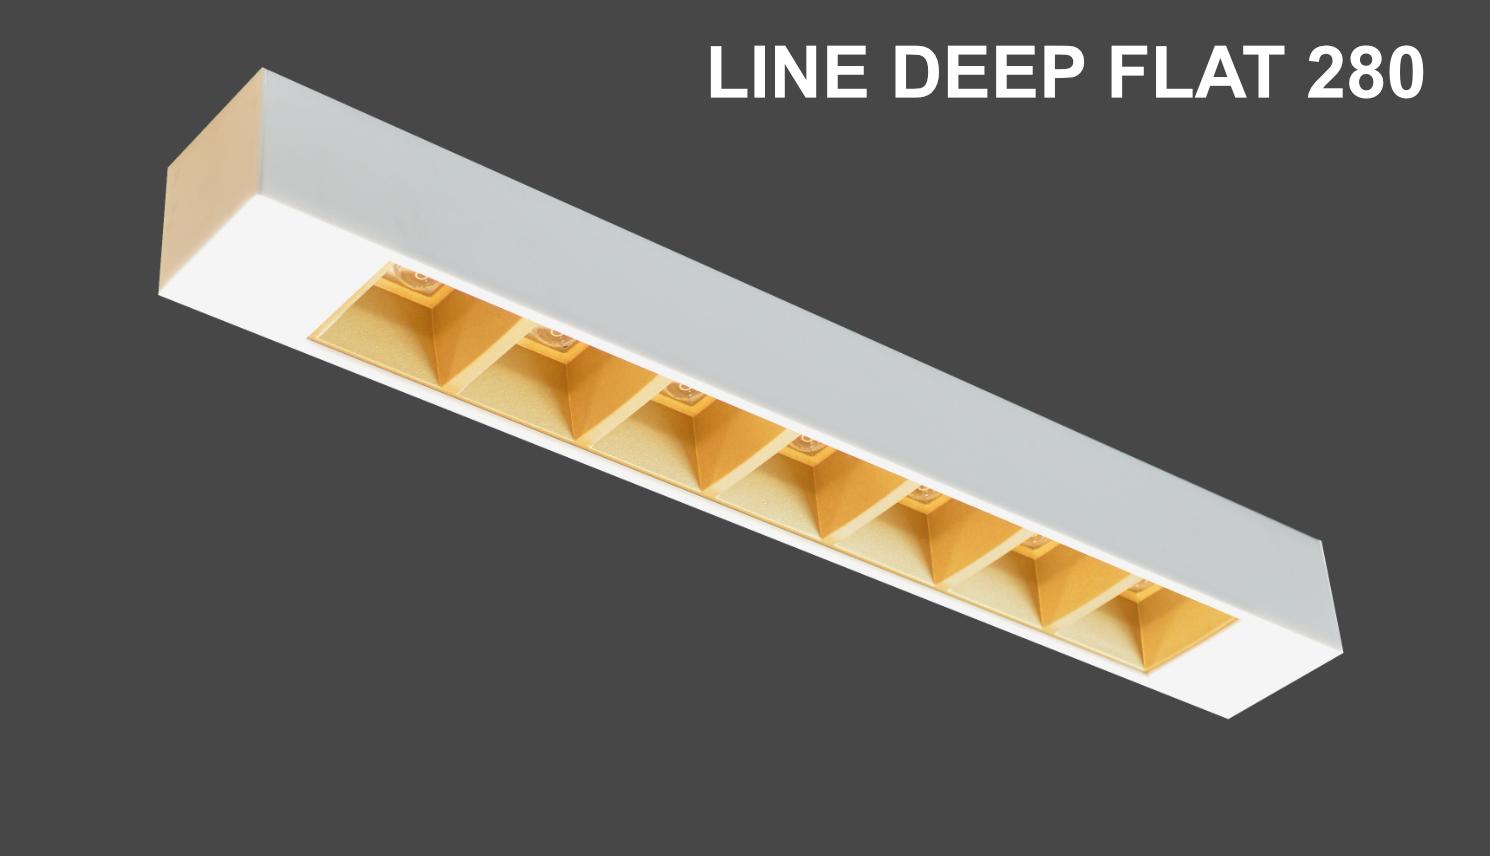 LINE DEEP FLAT 280